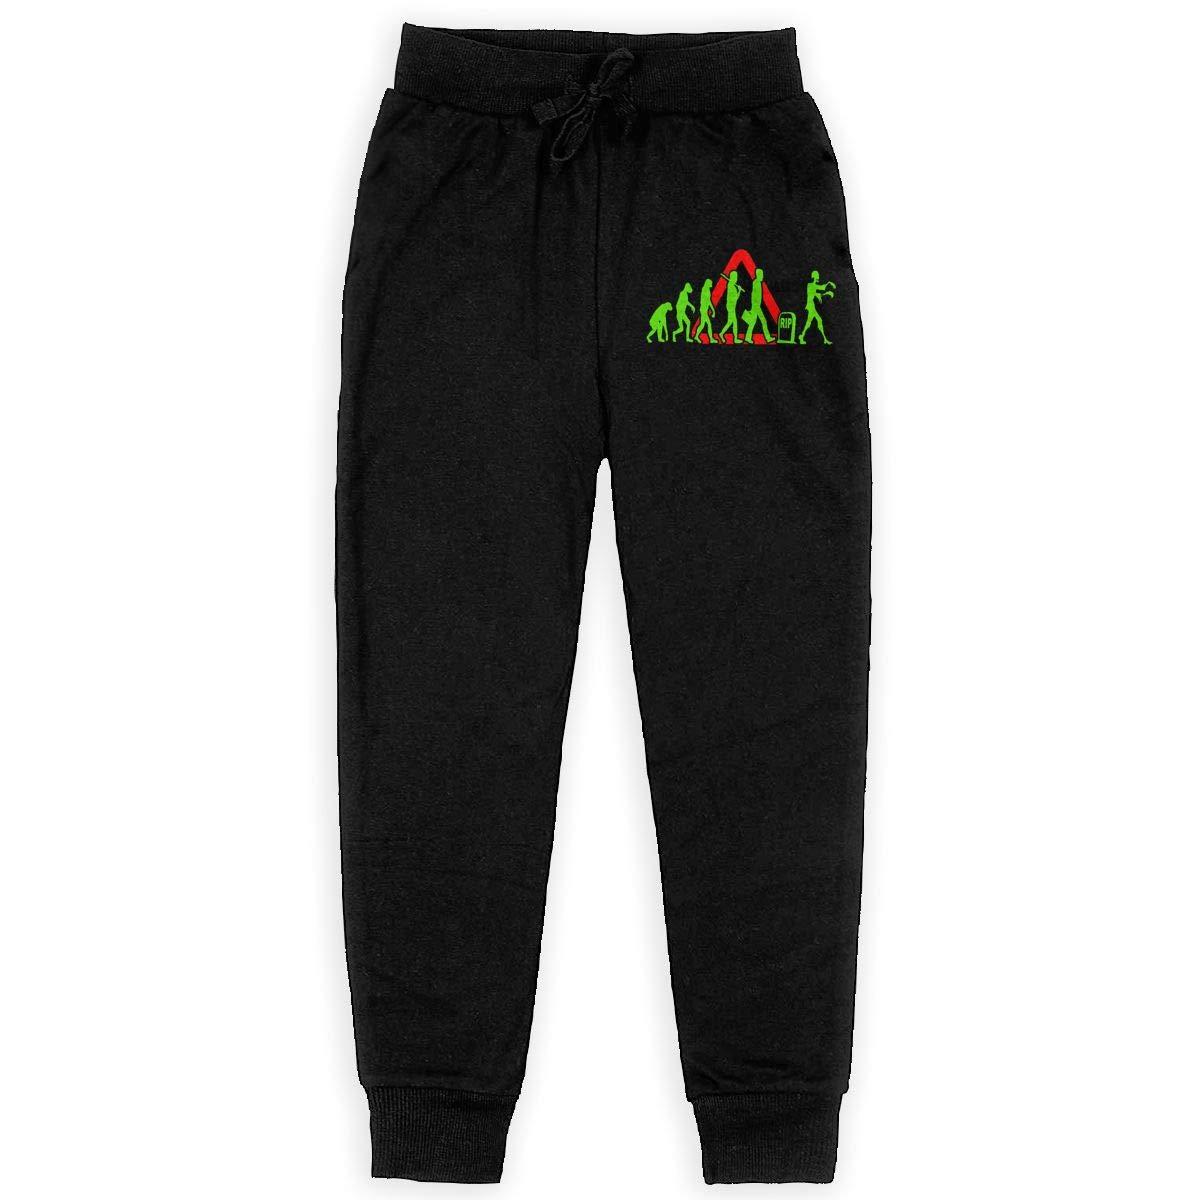 Bing4Bing Funny Zombie Evolution Boys Cotton Sweatpants Joggers Pants Active Pants